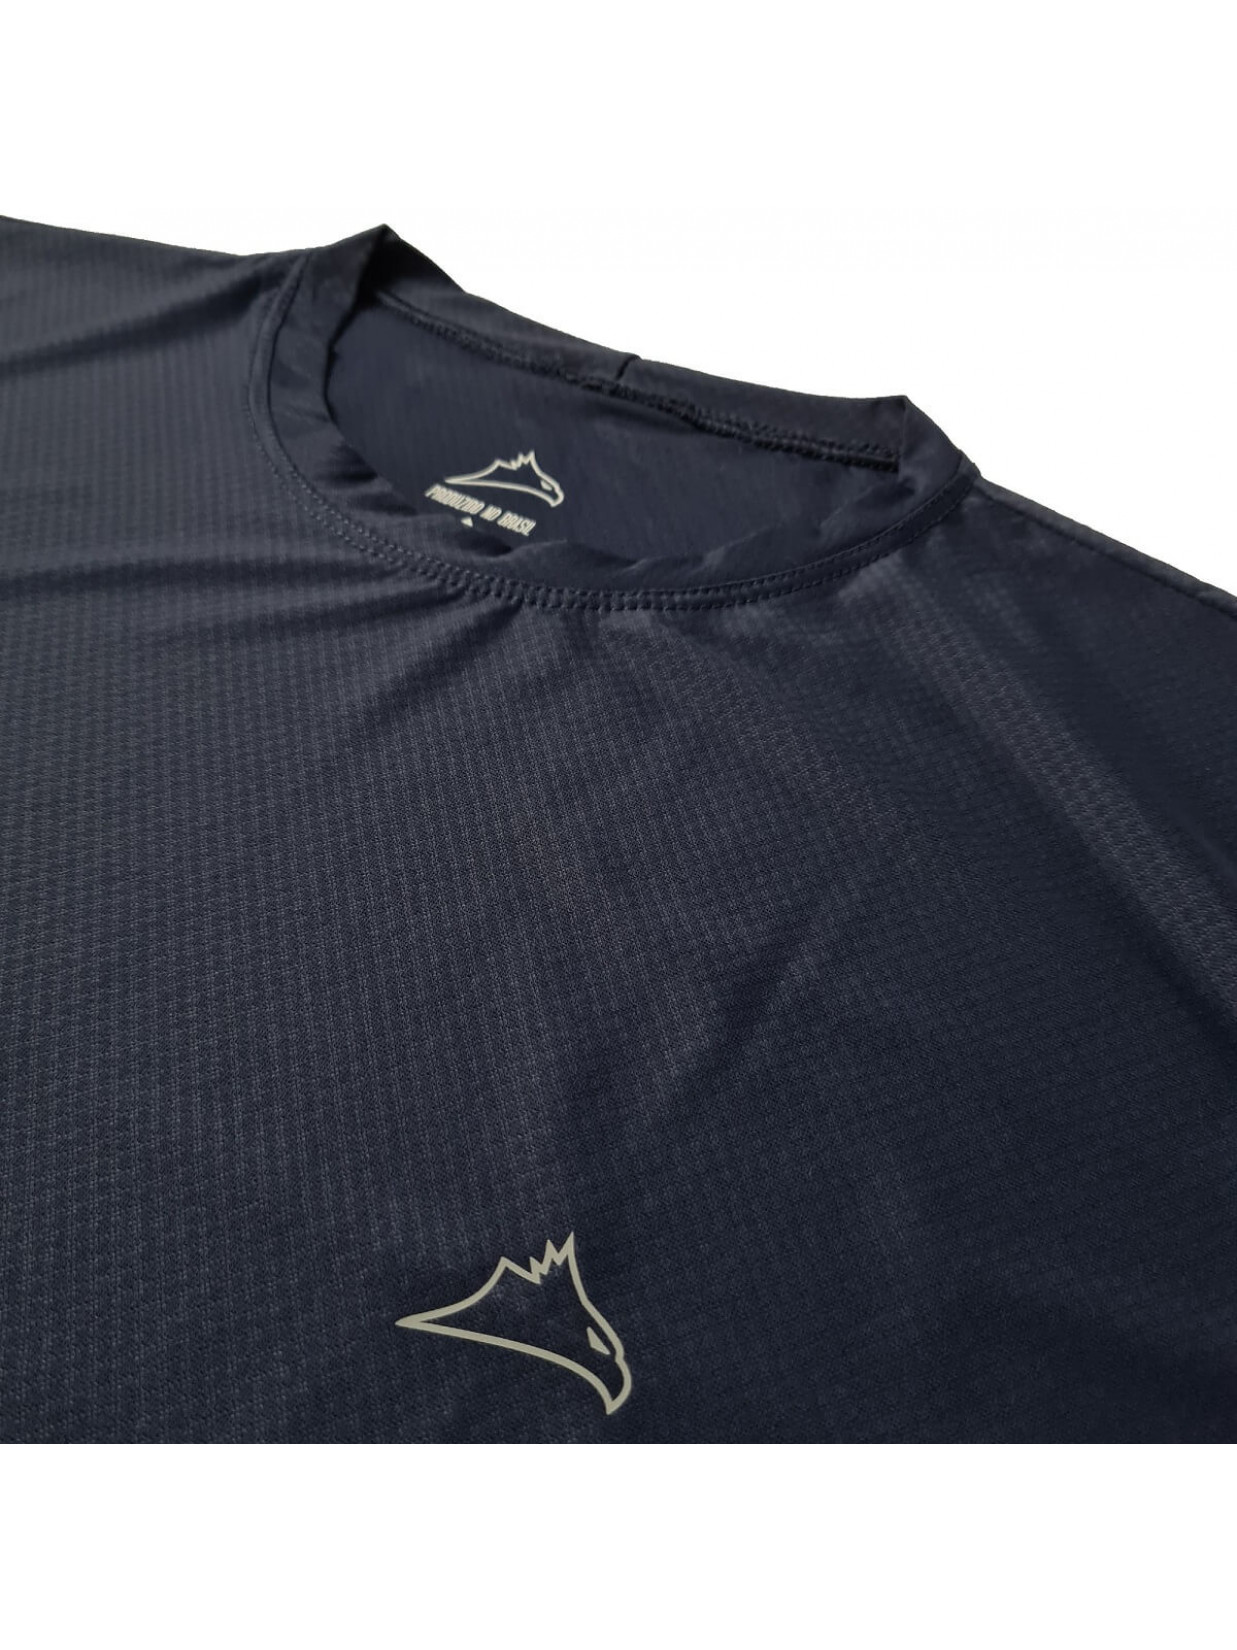 Camiseta Dry Cool UPF50+ Masculina (Manga Curta) Conquista